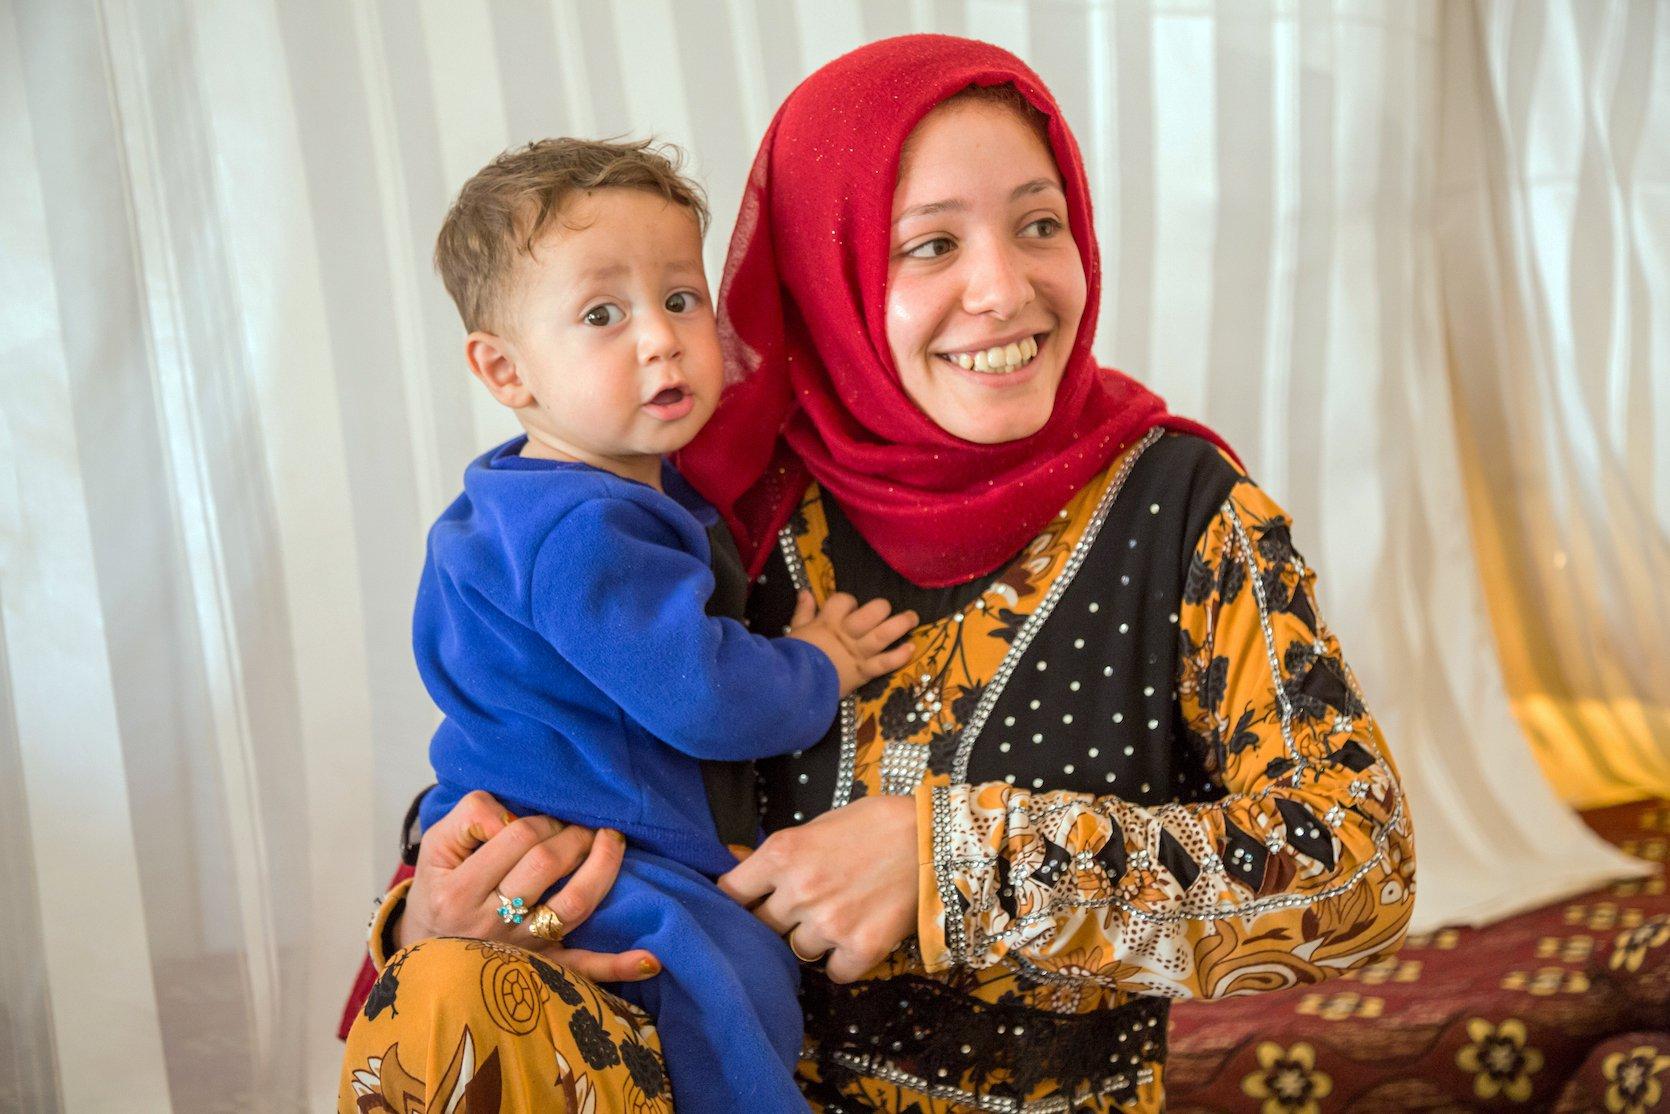 Adolescent girl in Jordan